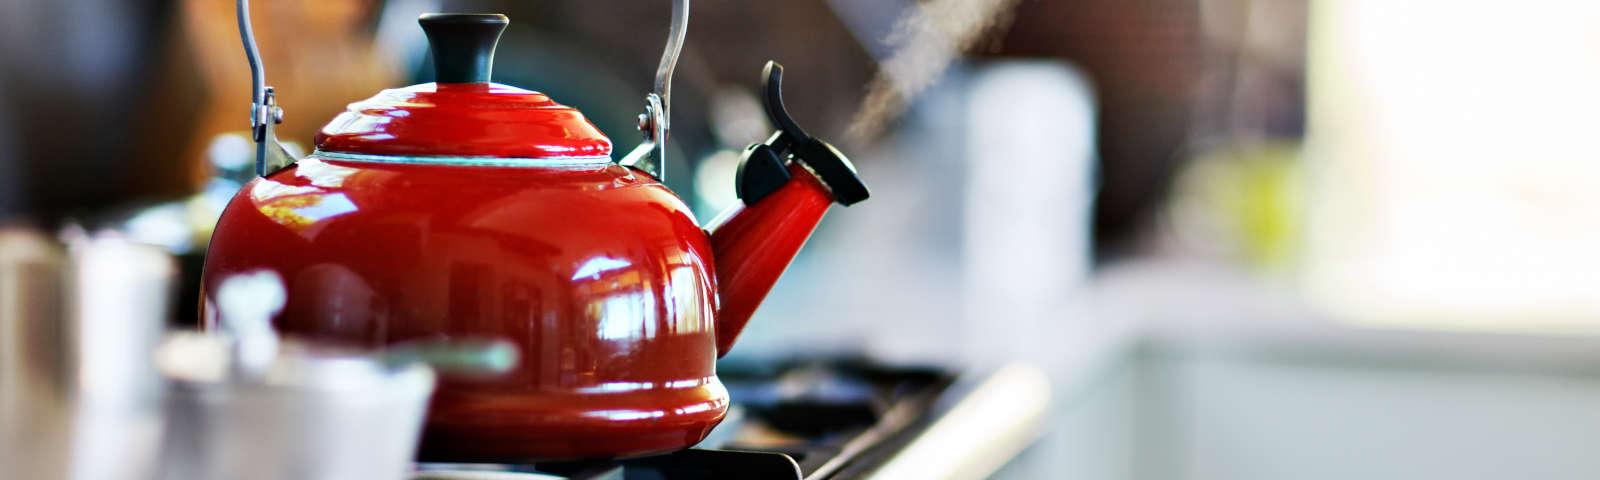 чайник на газовую плиту фото